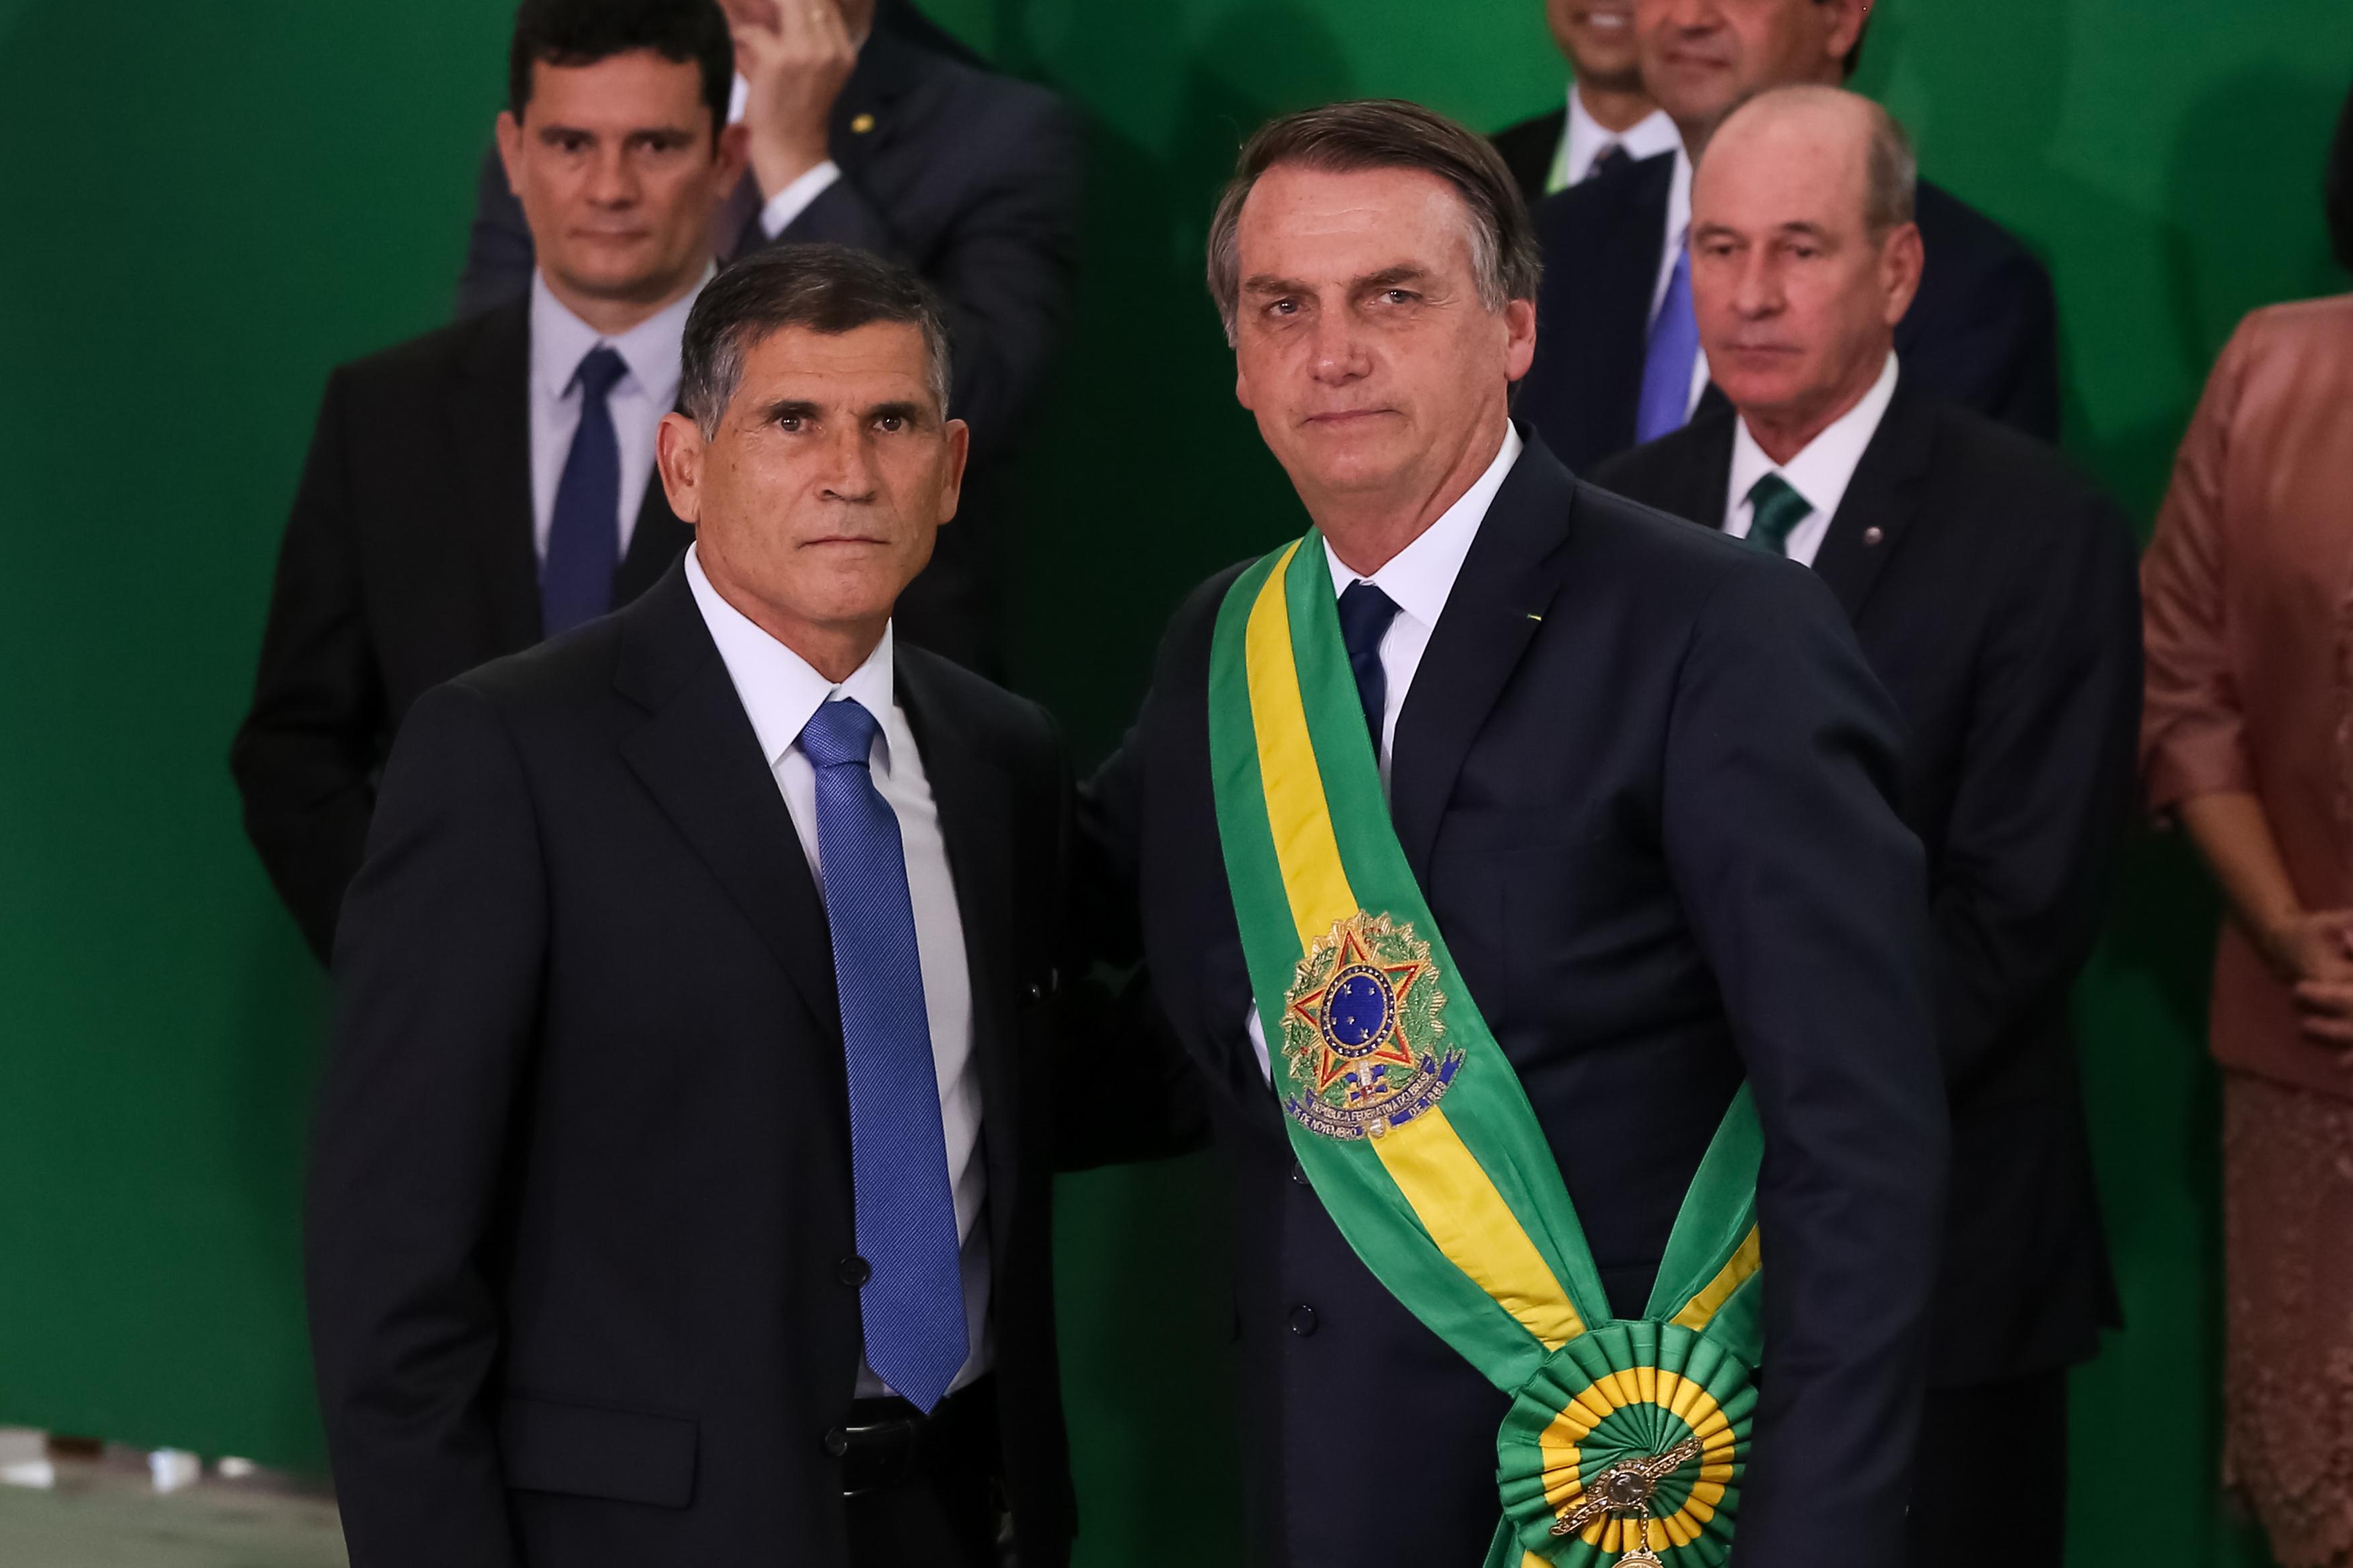 General Santos Cruz e Jair Bolsonaro